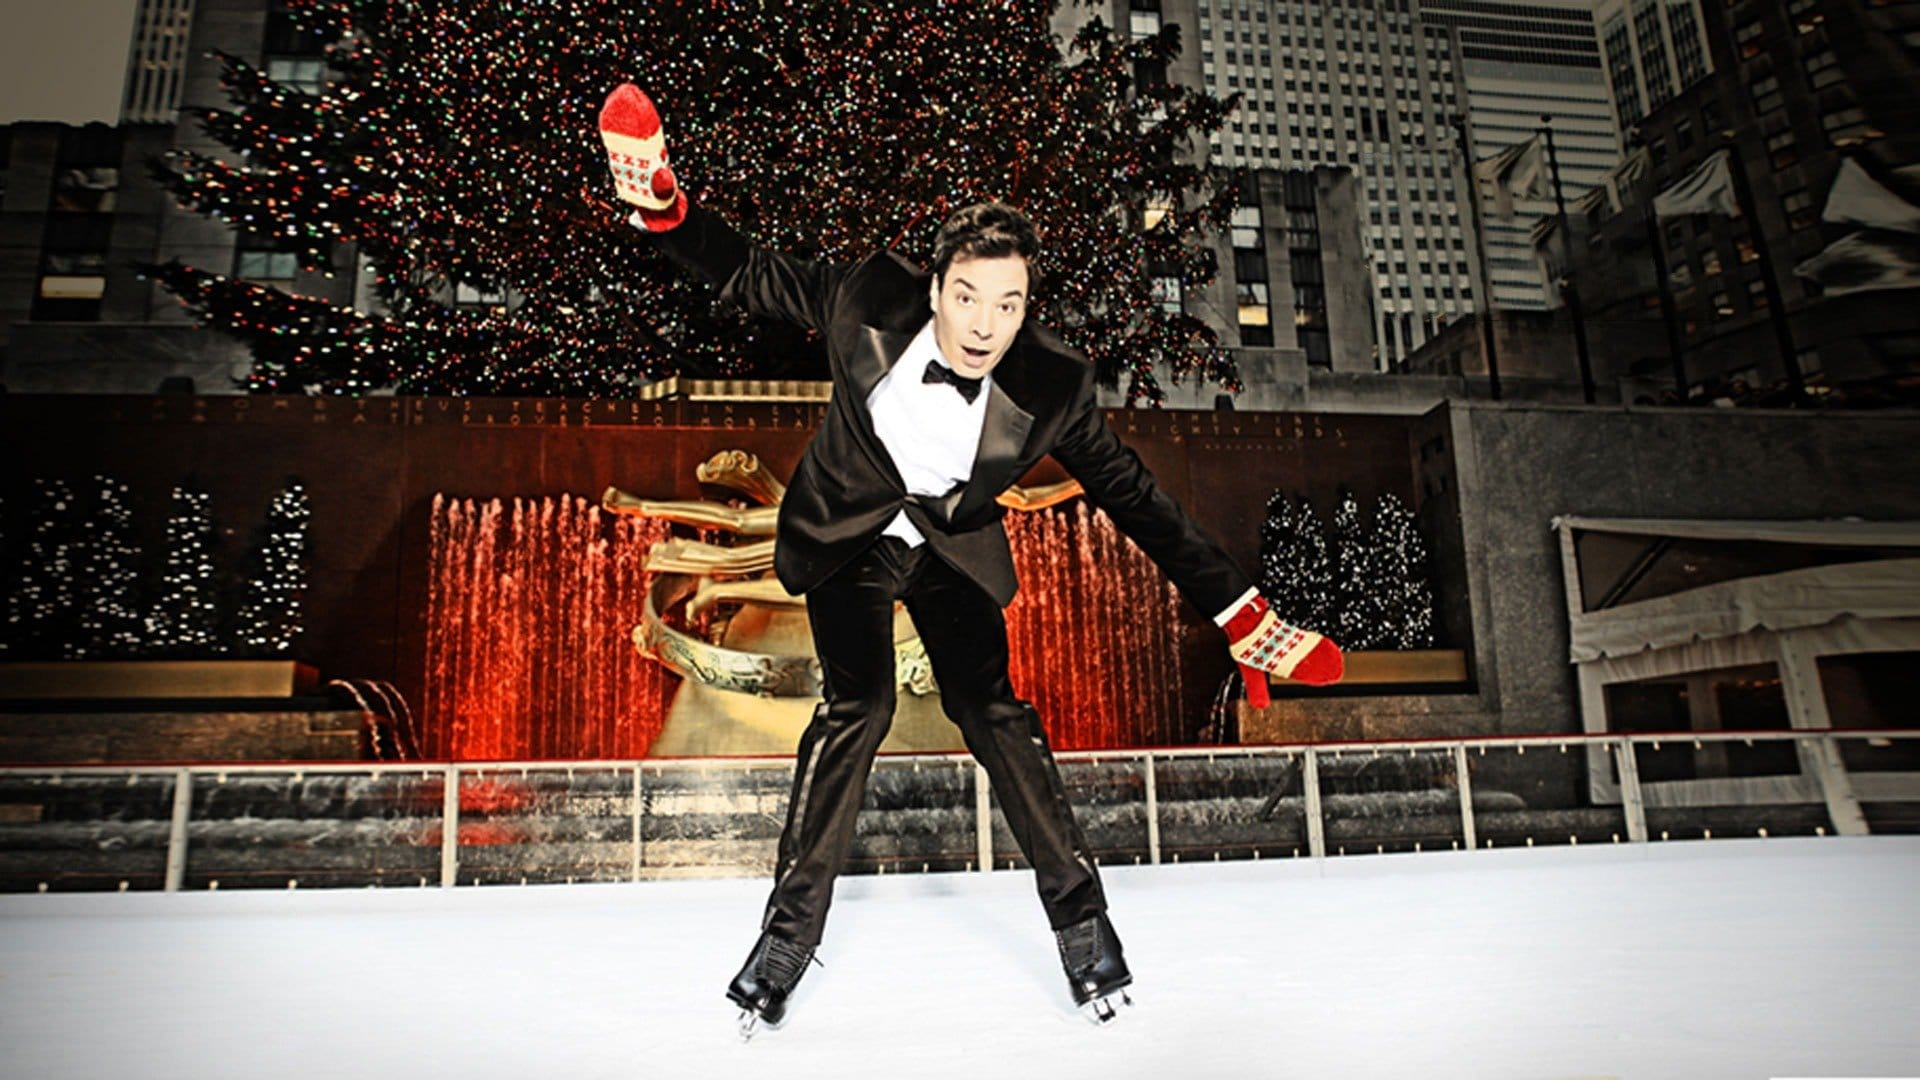 Jimmy Fallon: December 17, 2011